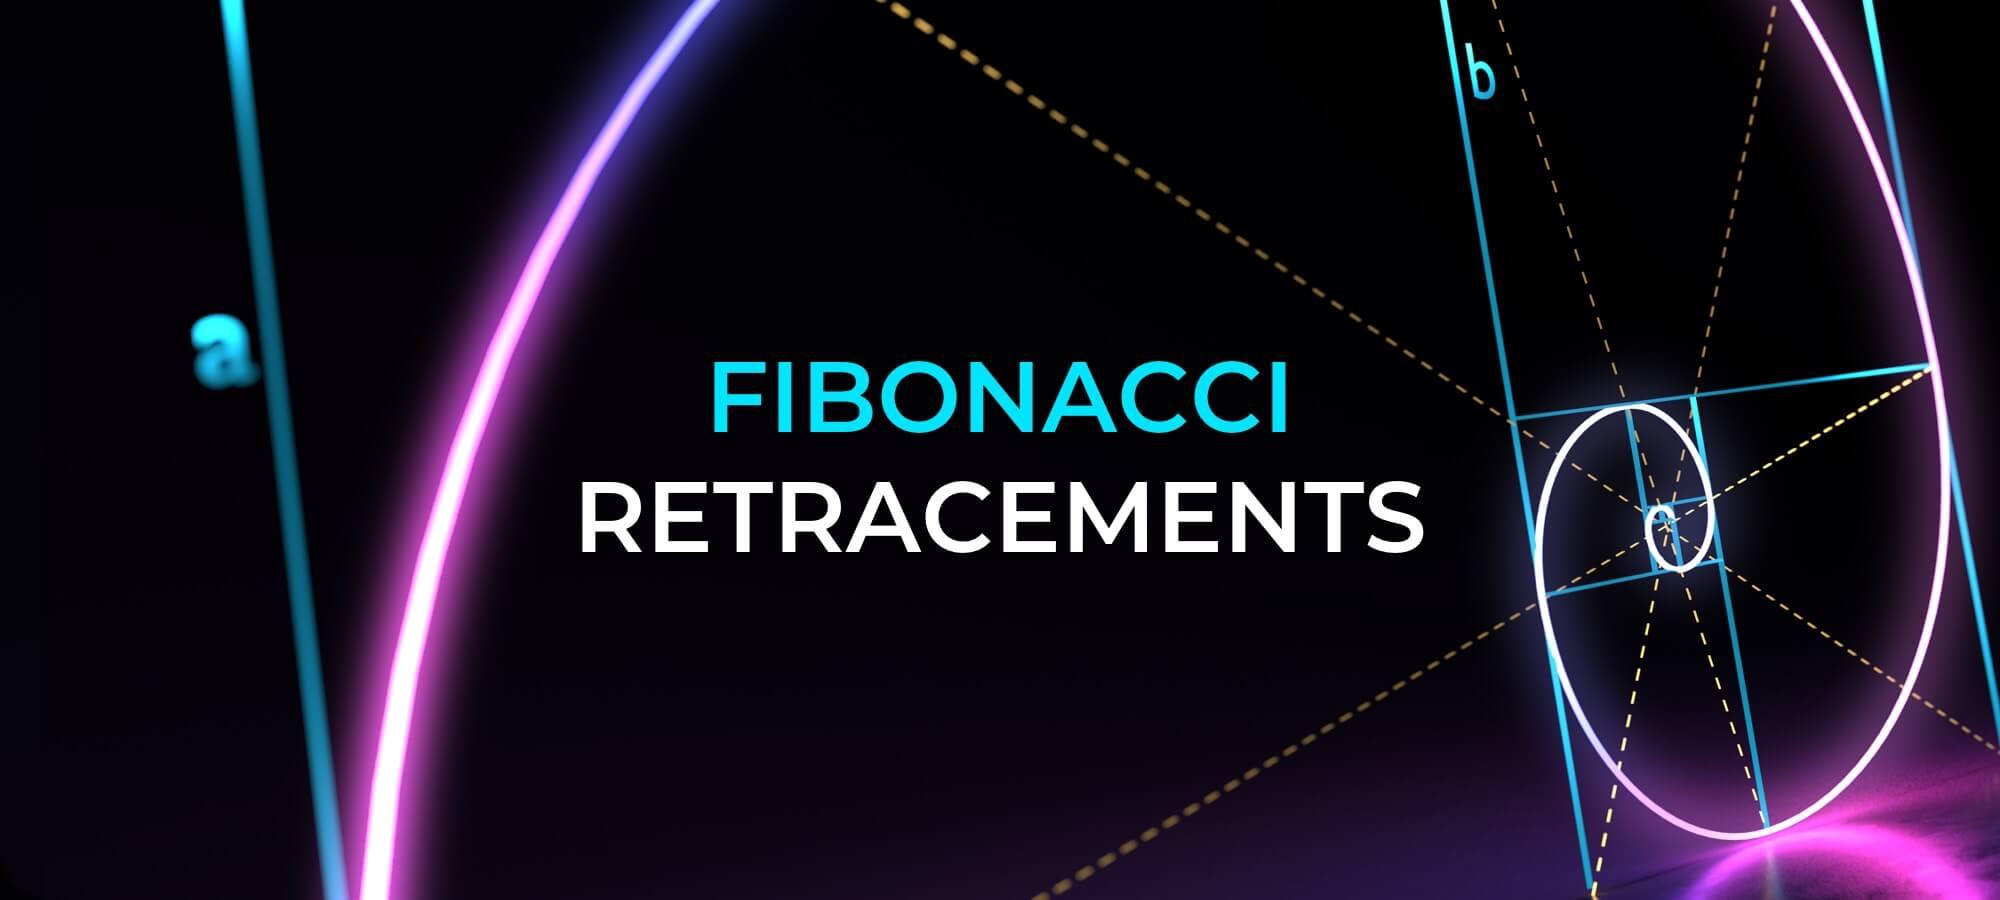 How to trade binary options using fibonacci